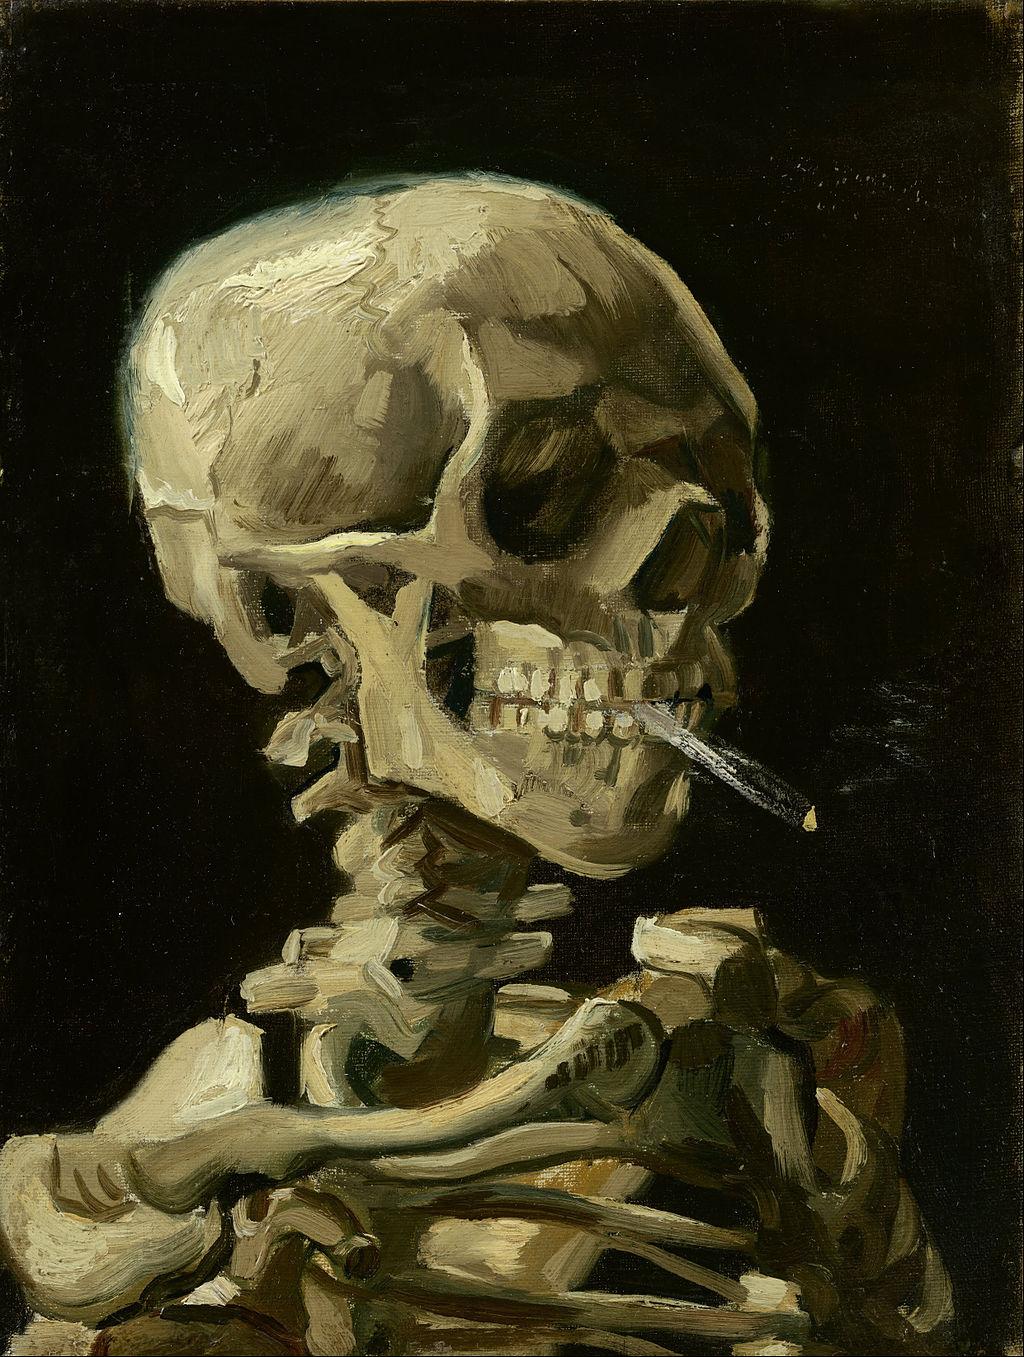 Dentist Creve Coeur MO, Artistic Dentistry 63141